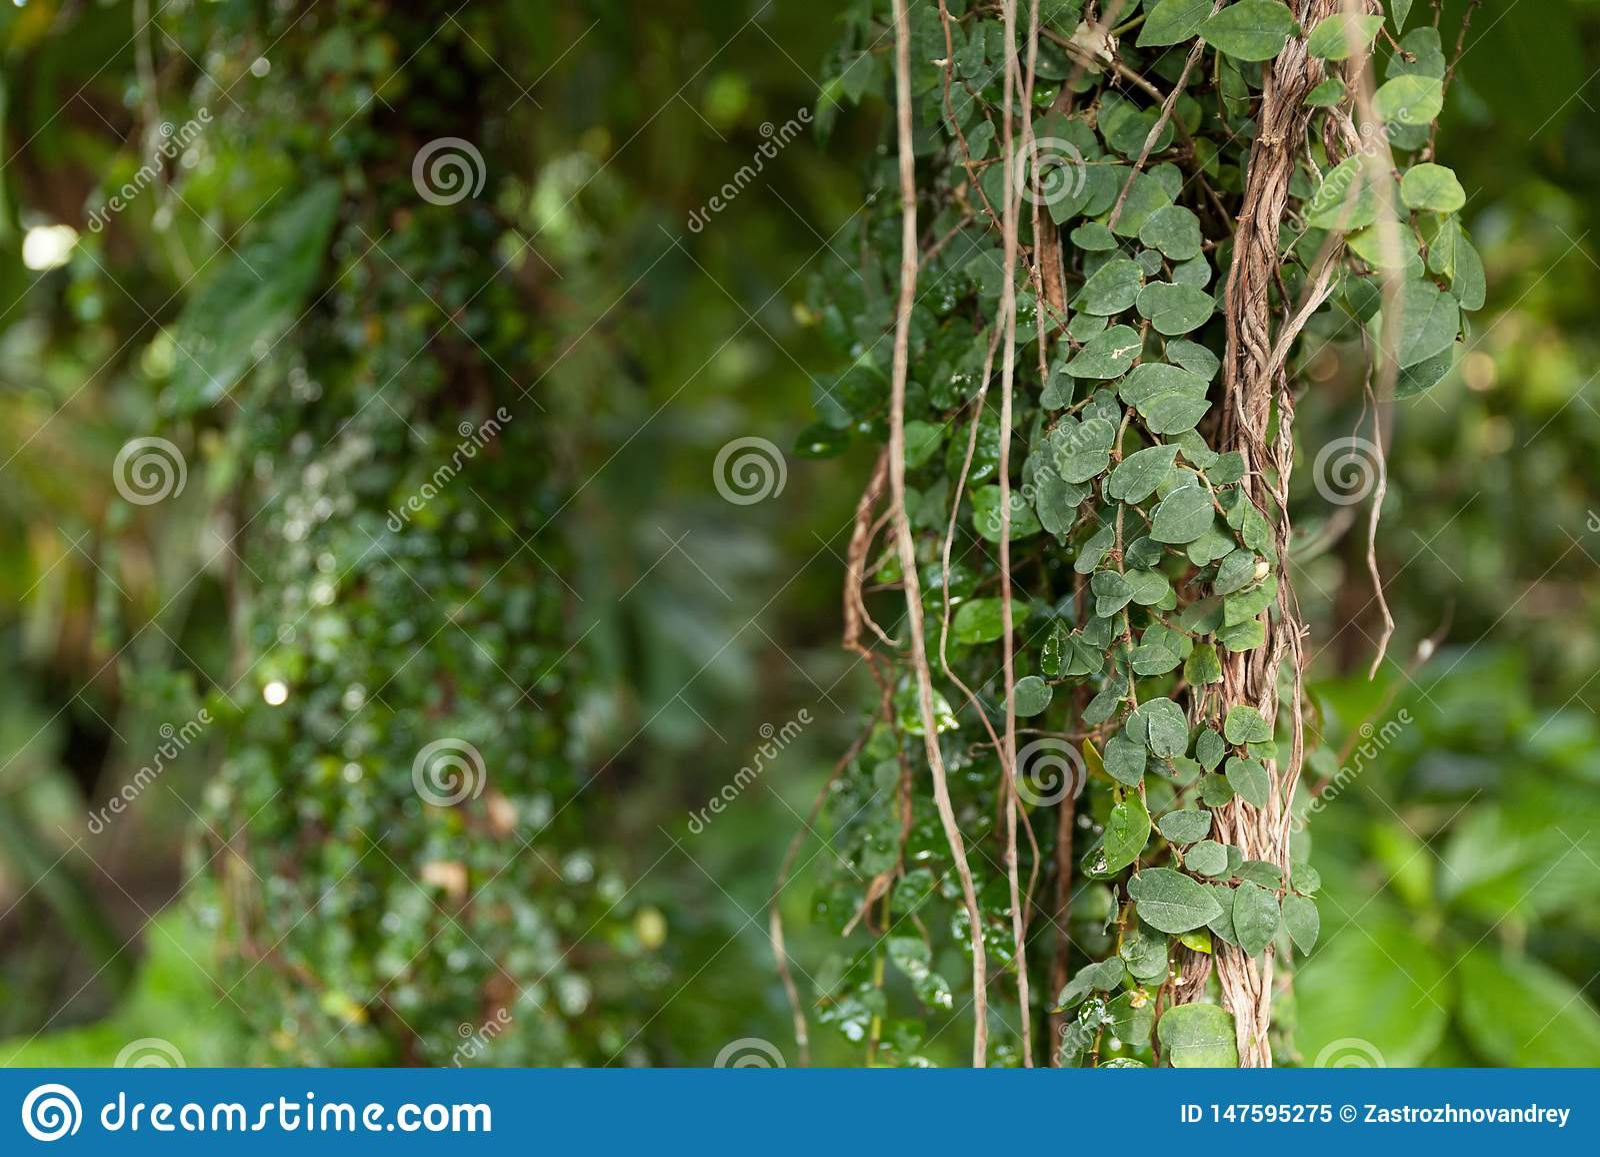 Climbing green tropical plant. Exotic beautiful plants.